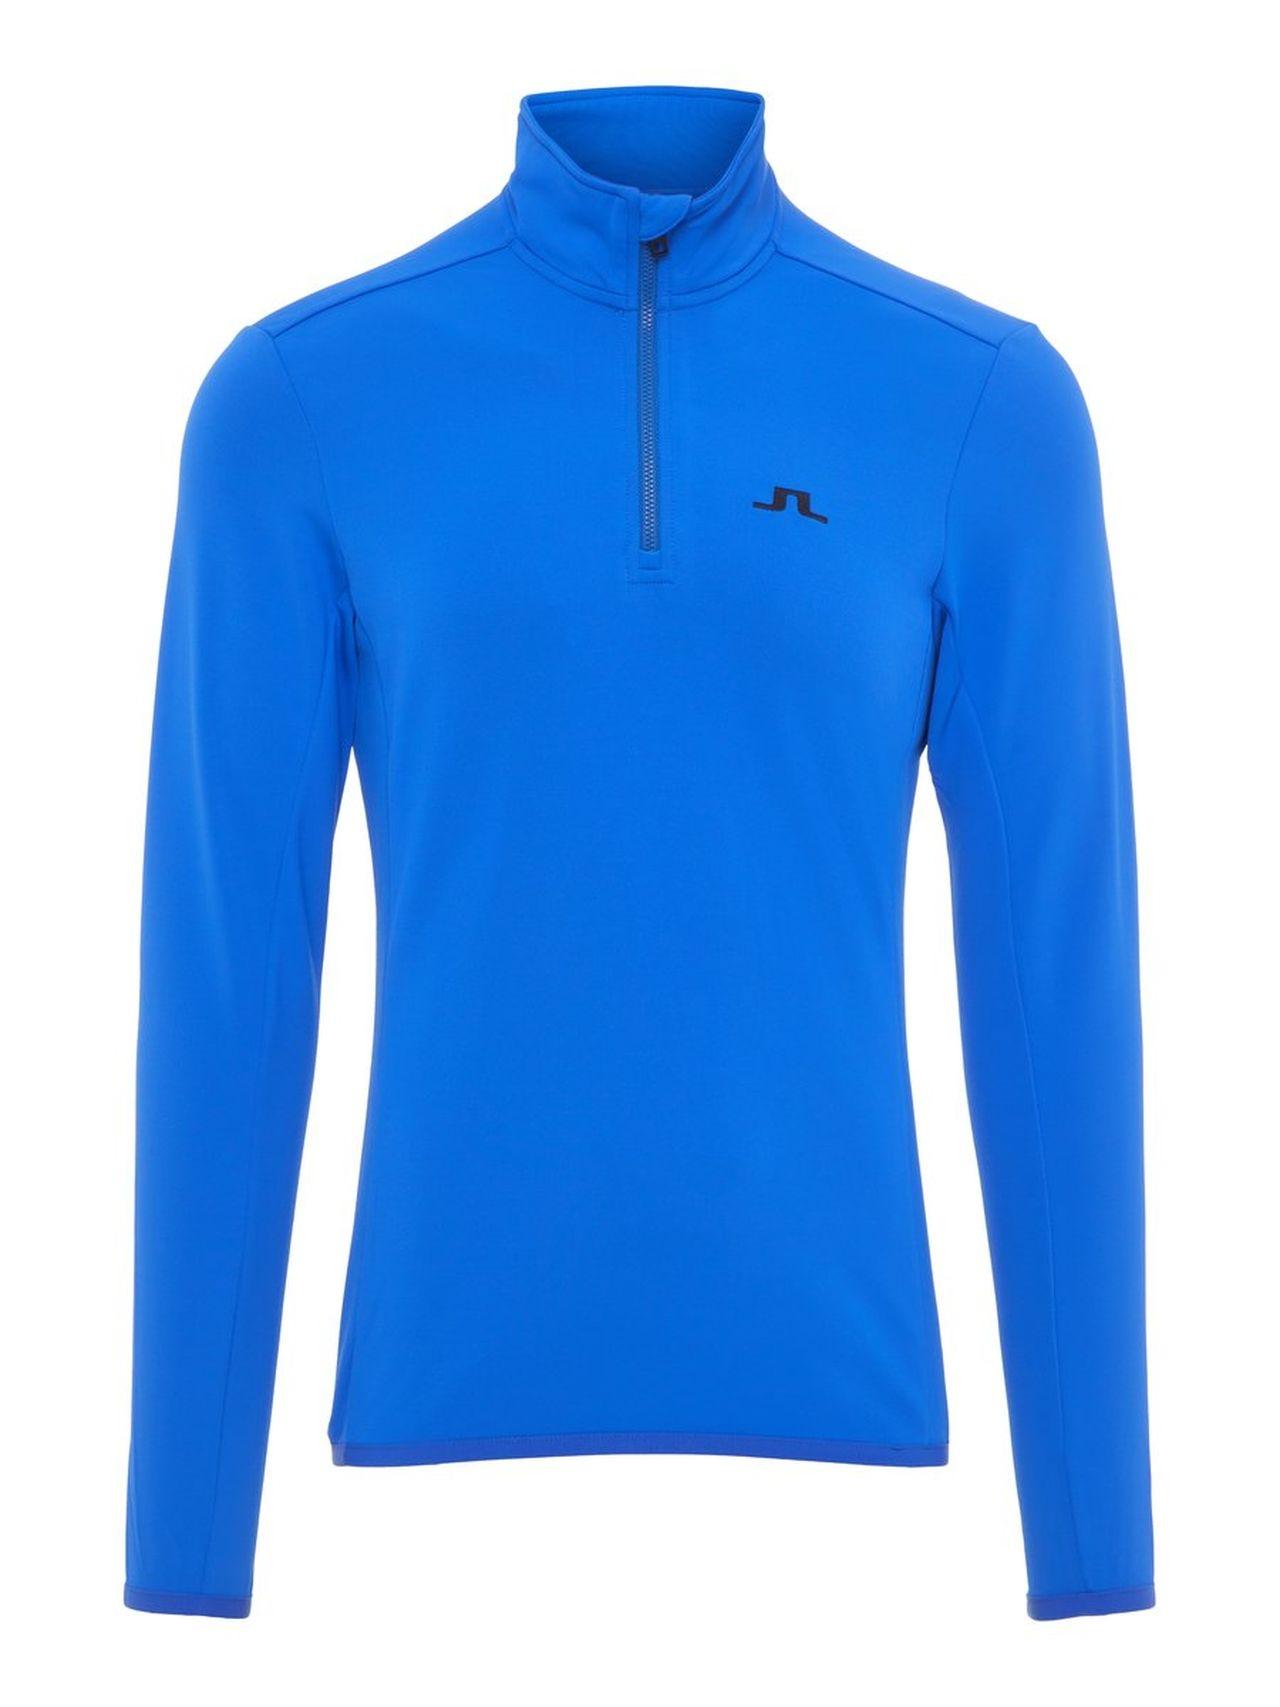 J.LINDEBERG Kimball Half Zip Fieldsensor Sweater Man Blå